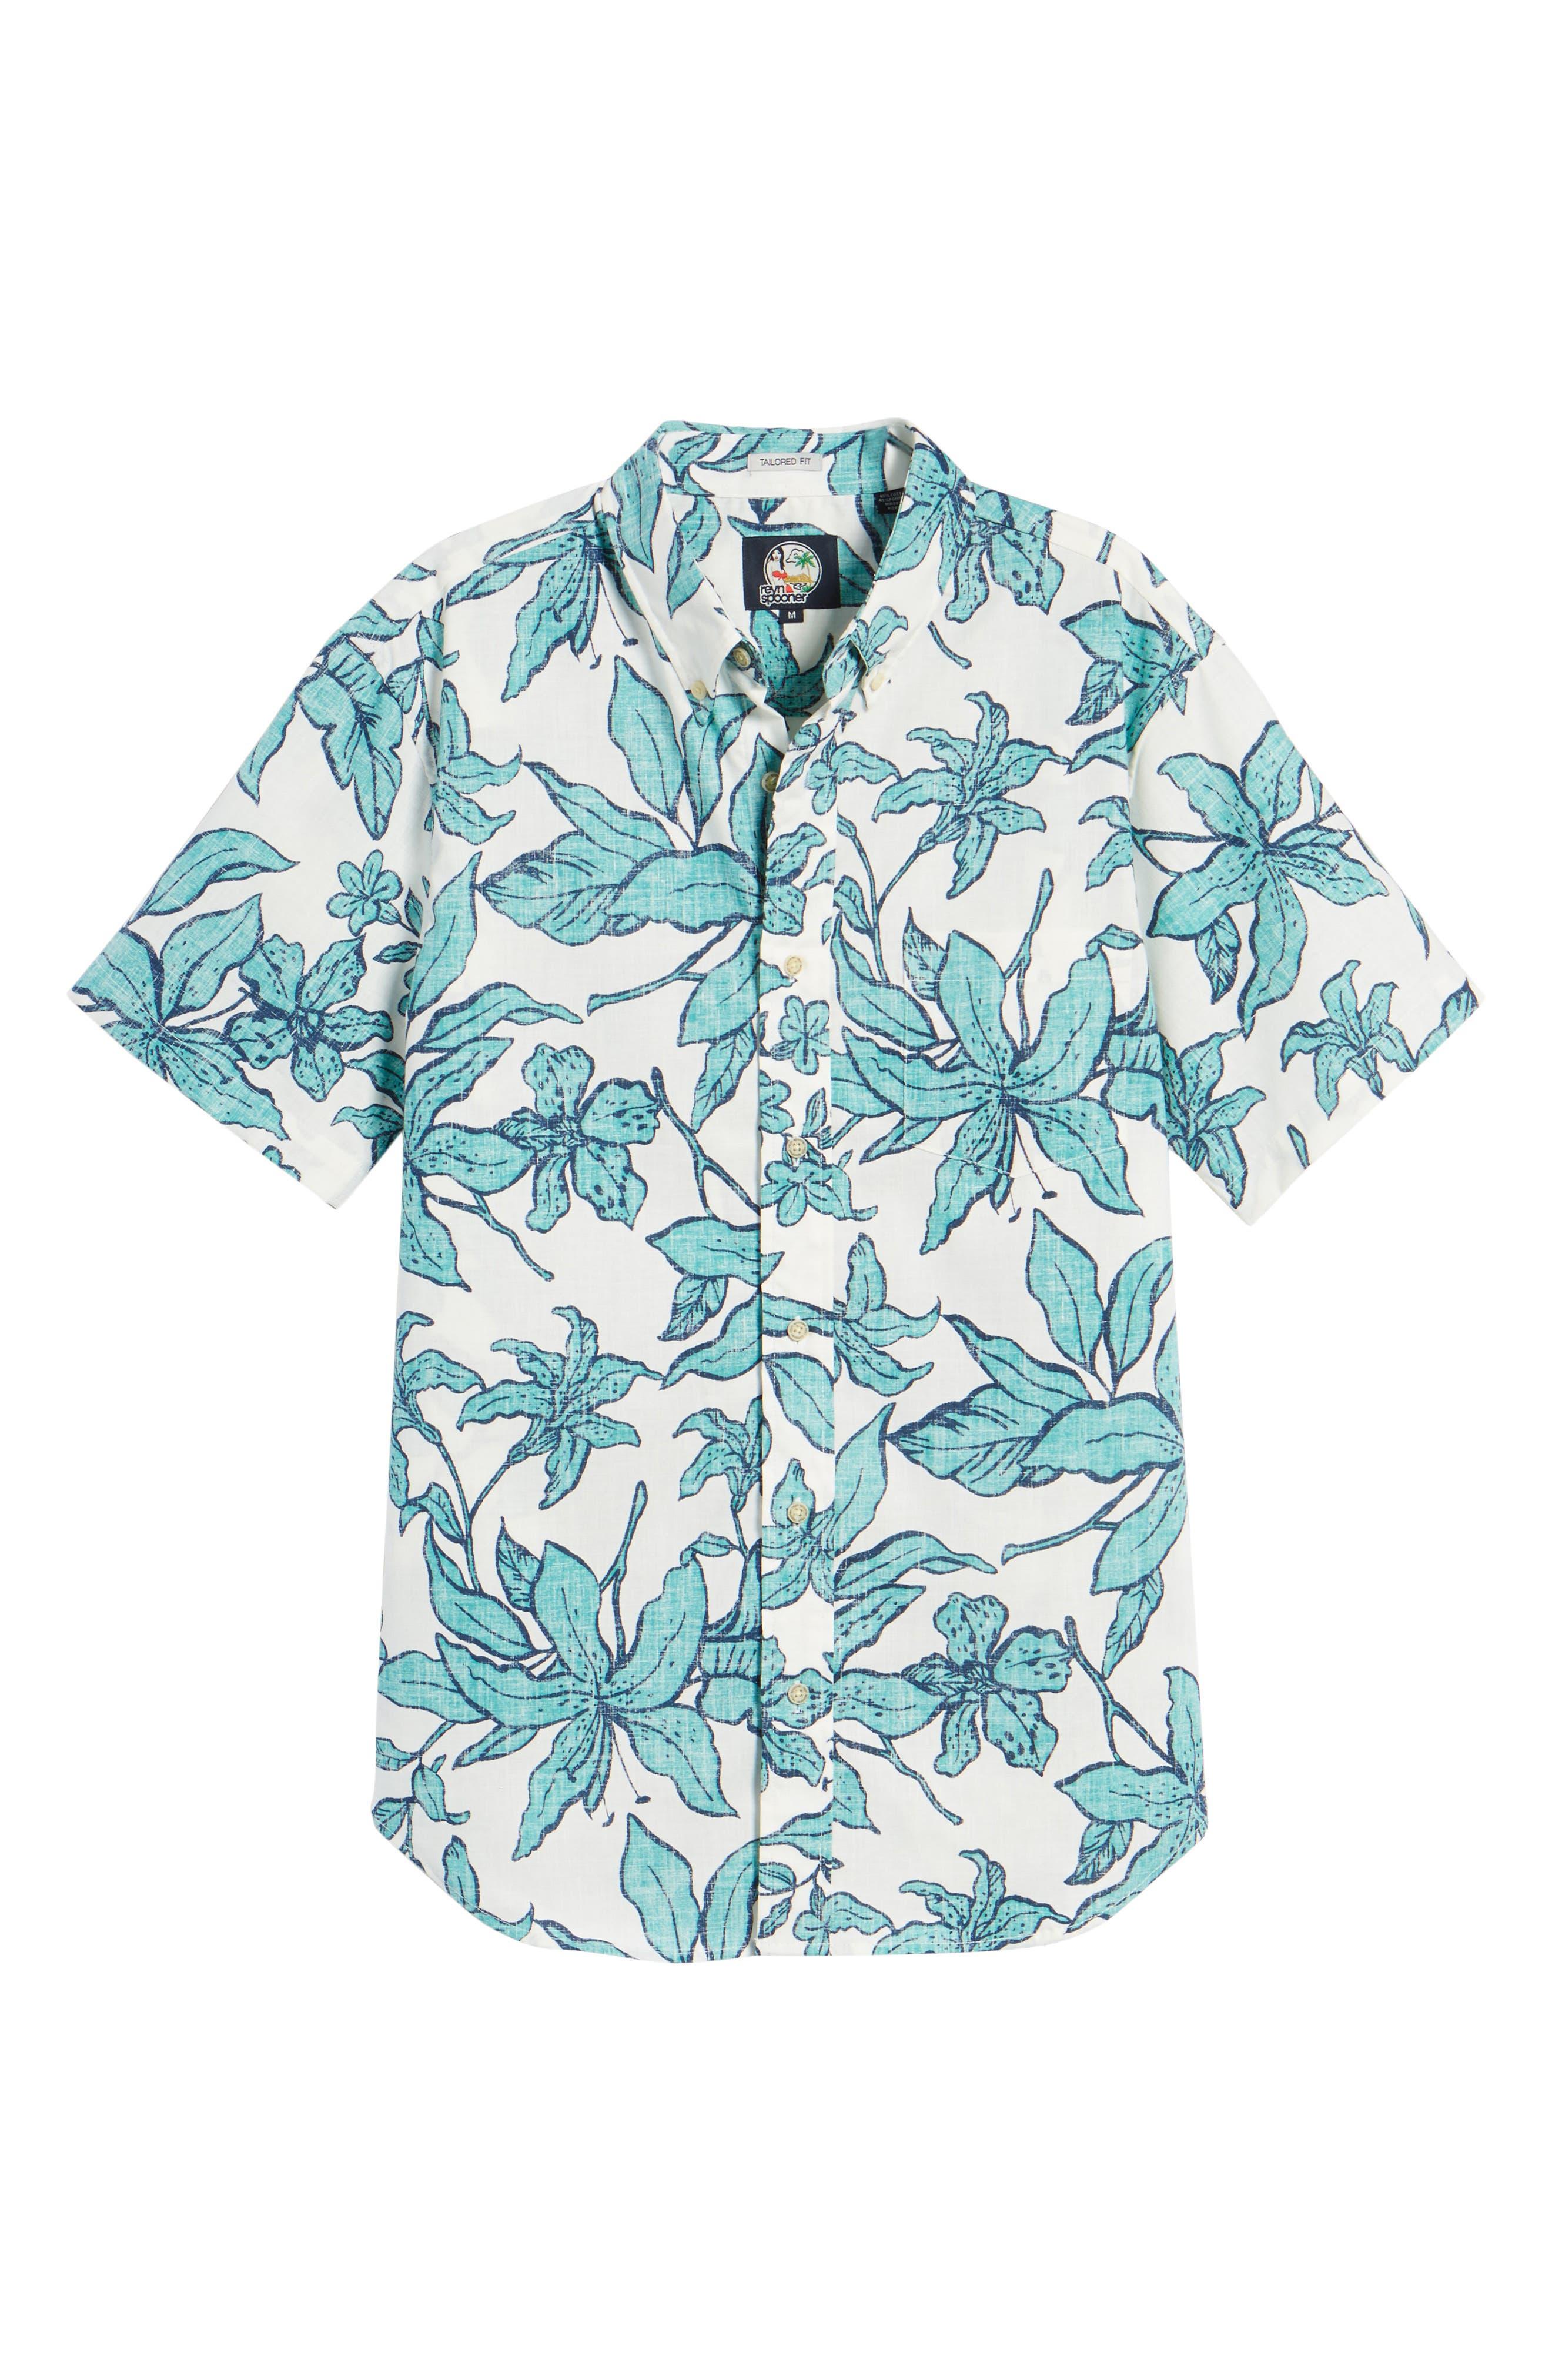 Luhiehu Tailored Fit Print Camp Shirt,                             Alternate thumbnail 6, color,                             104